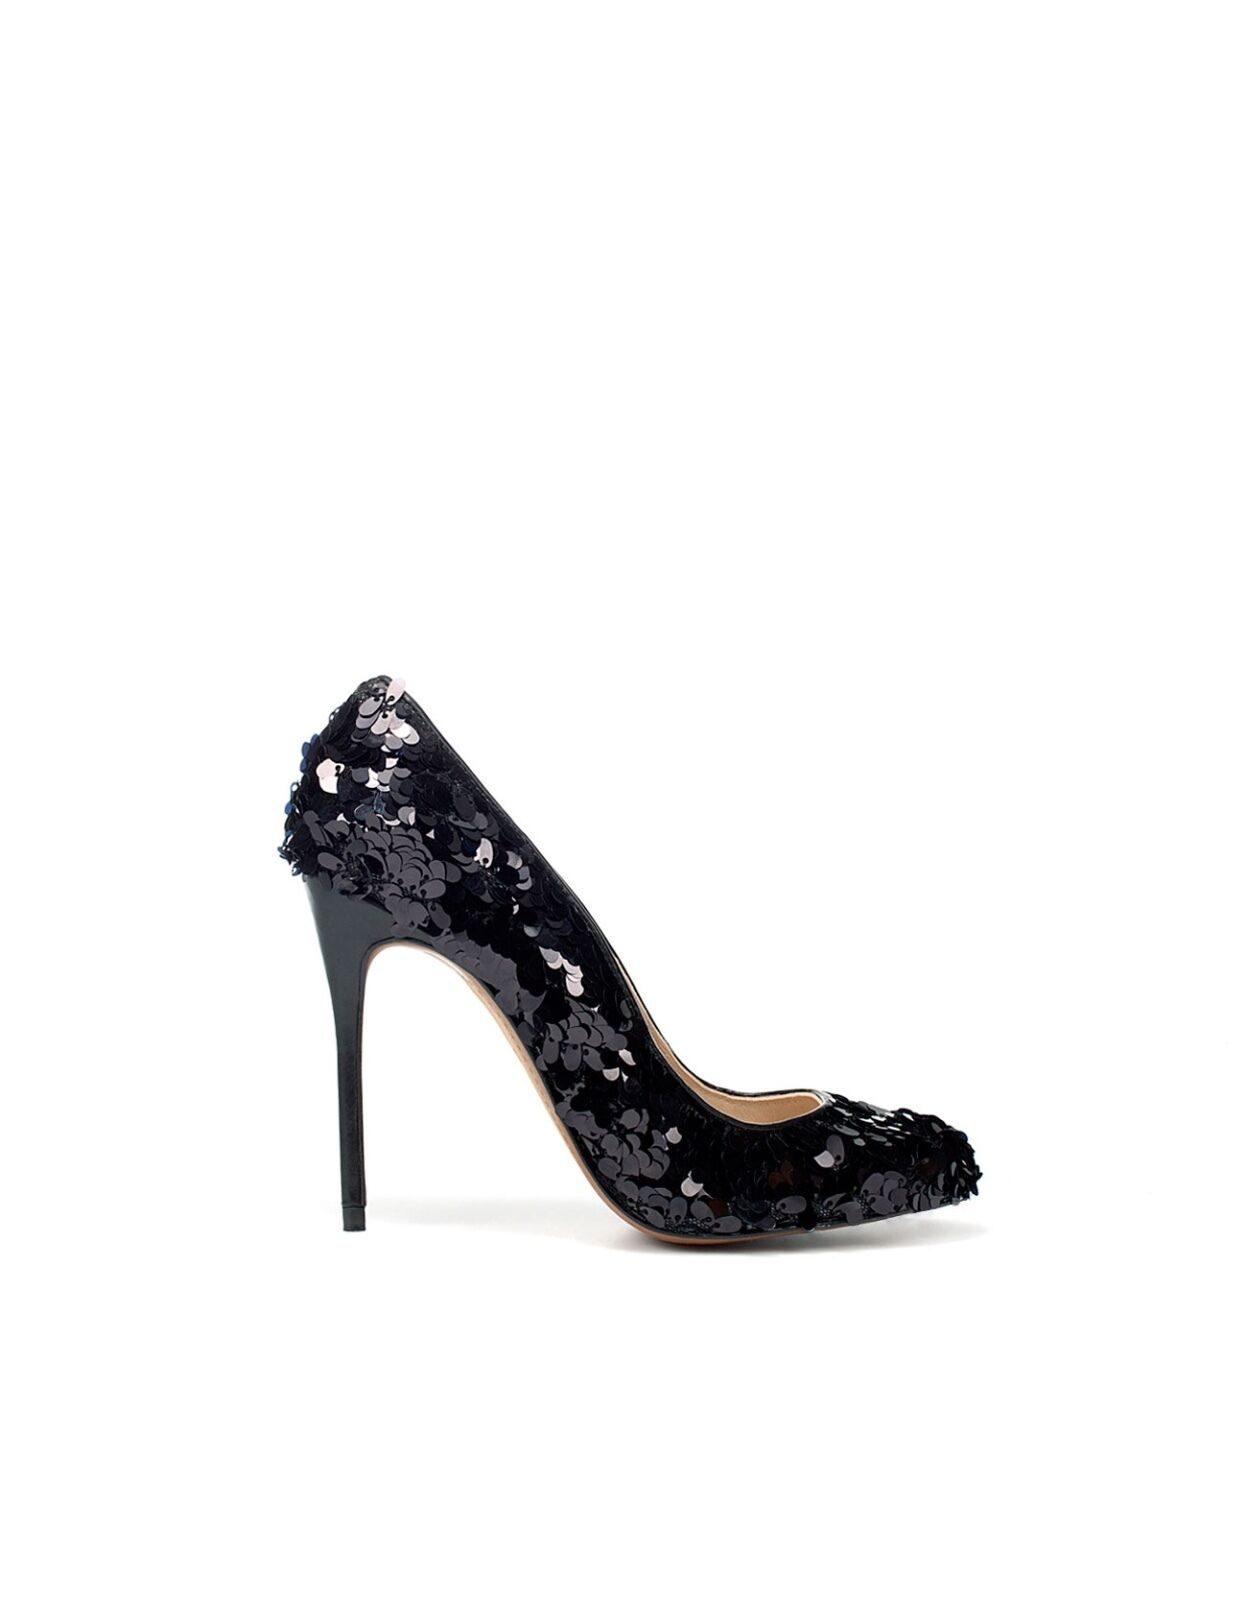 ZARA BNWT BLACK HIGH HEEL Schuhe WITH SEQUINS UK7 US9 EU40